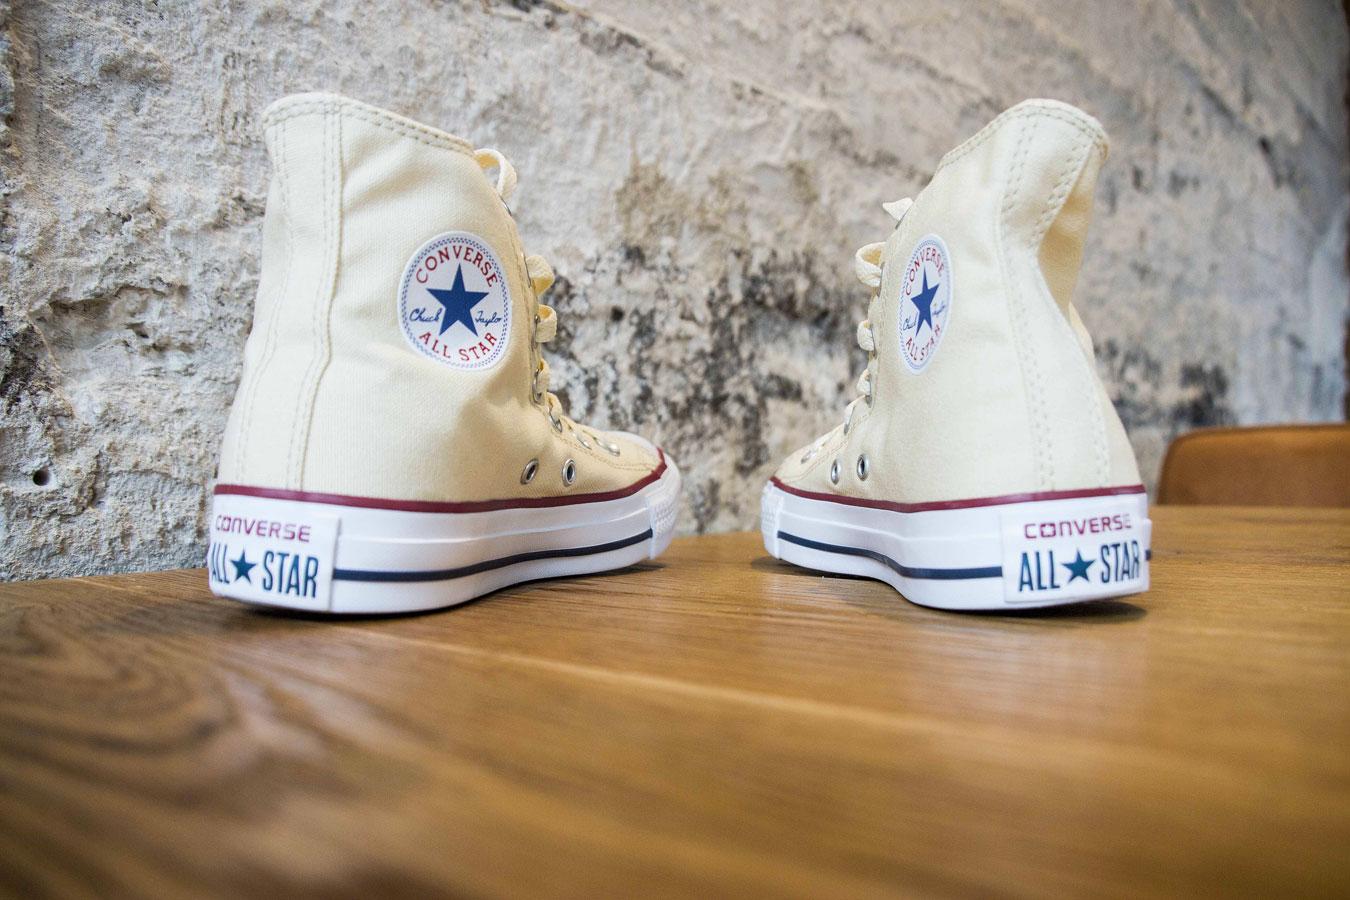 53e923c633bbd M9621 Converse Chuck Taylor All Star tenisky ZNAČKY|Converse ...